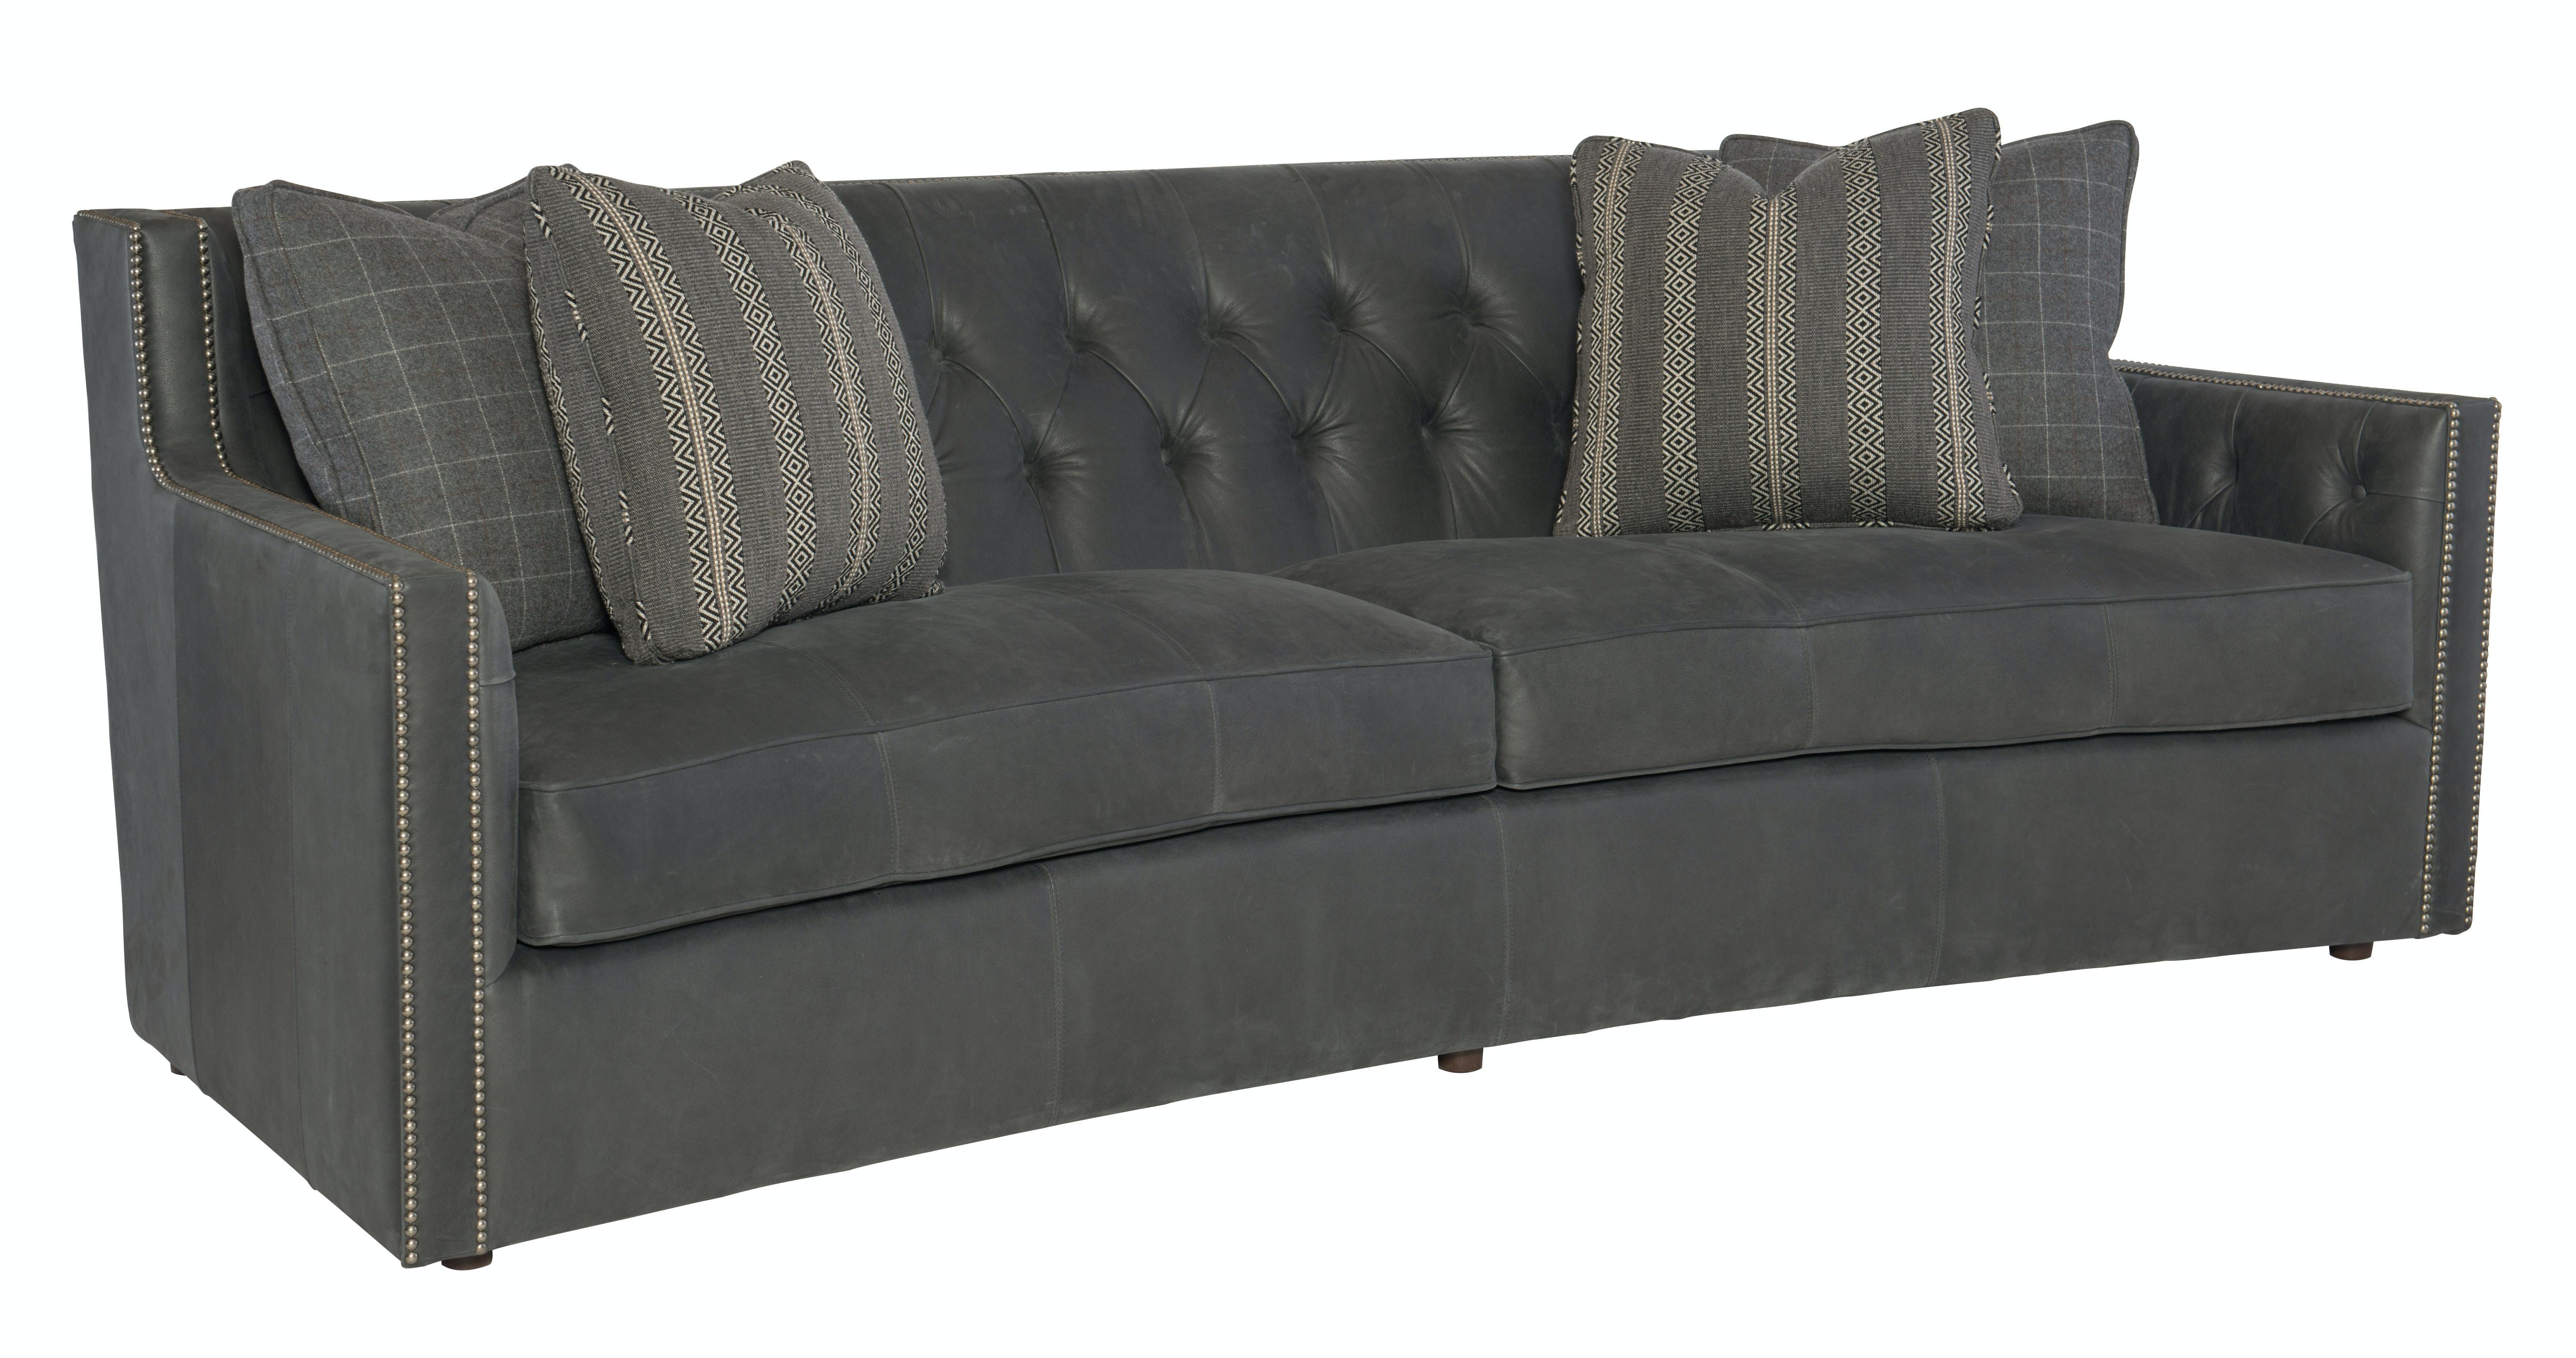 Candace Leather Sofa ST:490443